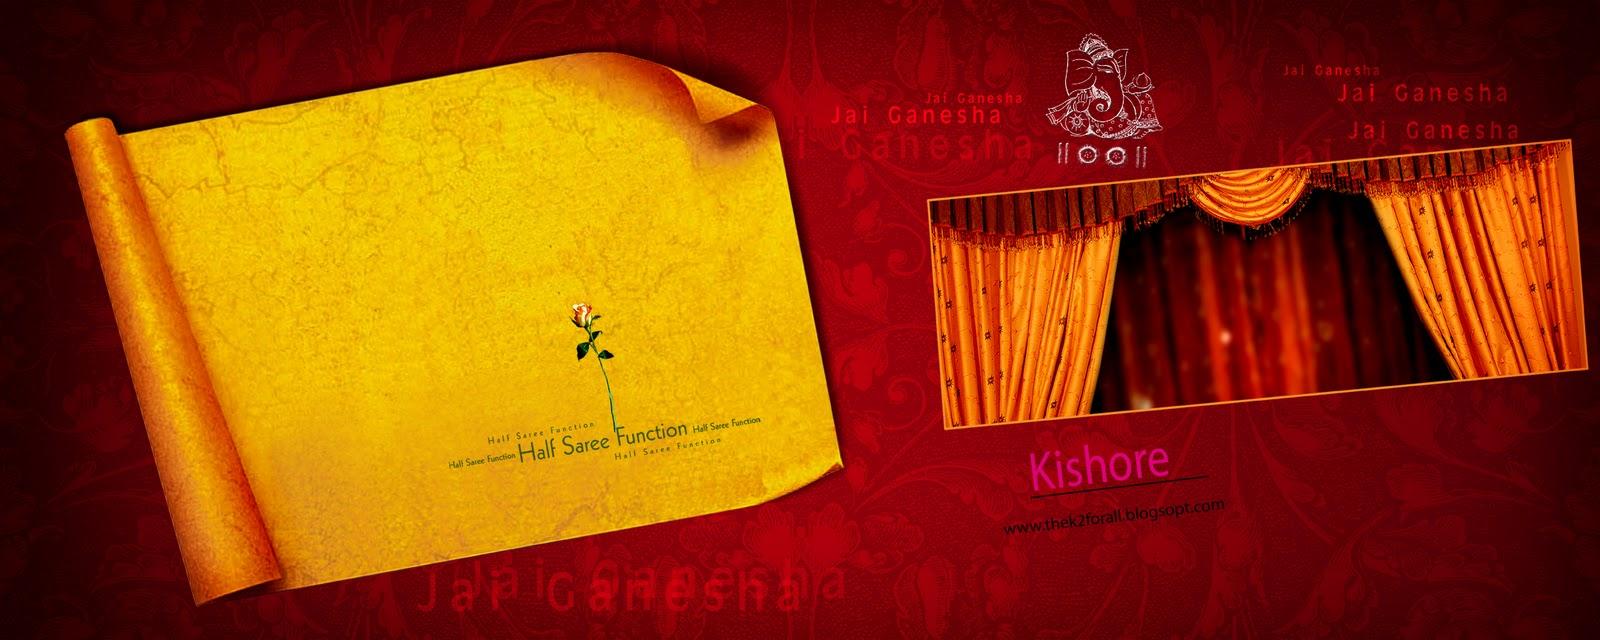 8 Karizma Album Background Psd Images - Karizma Album ... Karizma Wedding Album Software Free Download